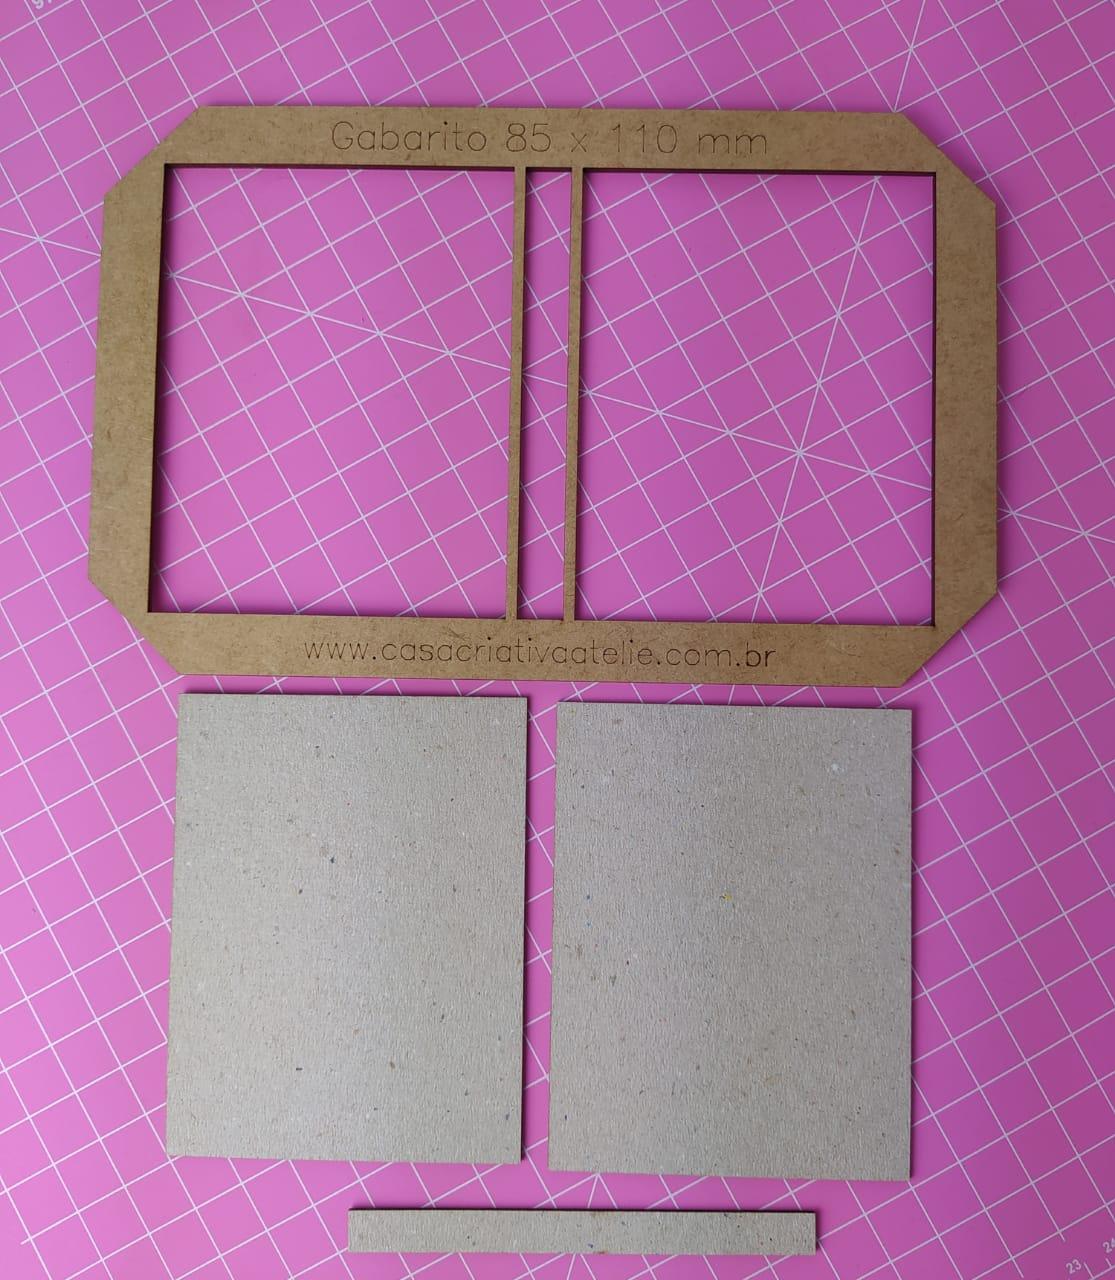 Kit Post it (Gabarito + 12 conjuntos de Papelão Cinza Tipo Holler) - 8,5 x 11,0 cm